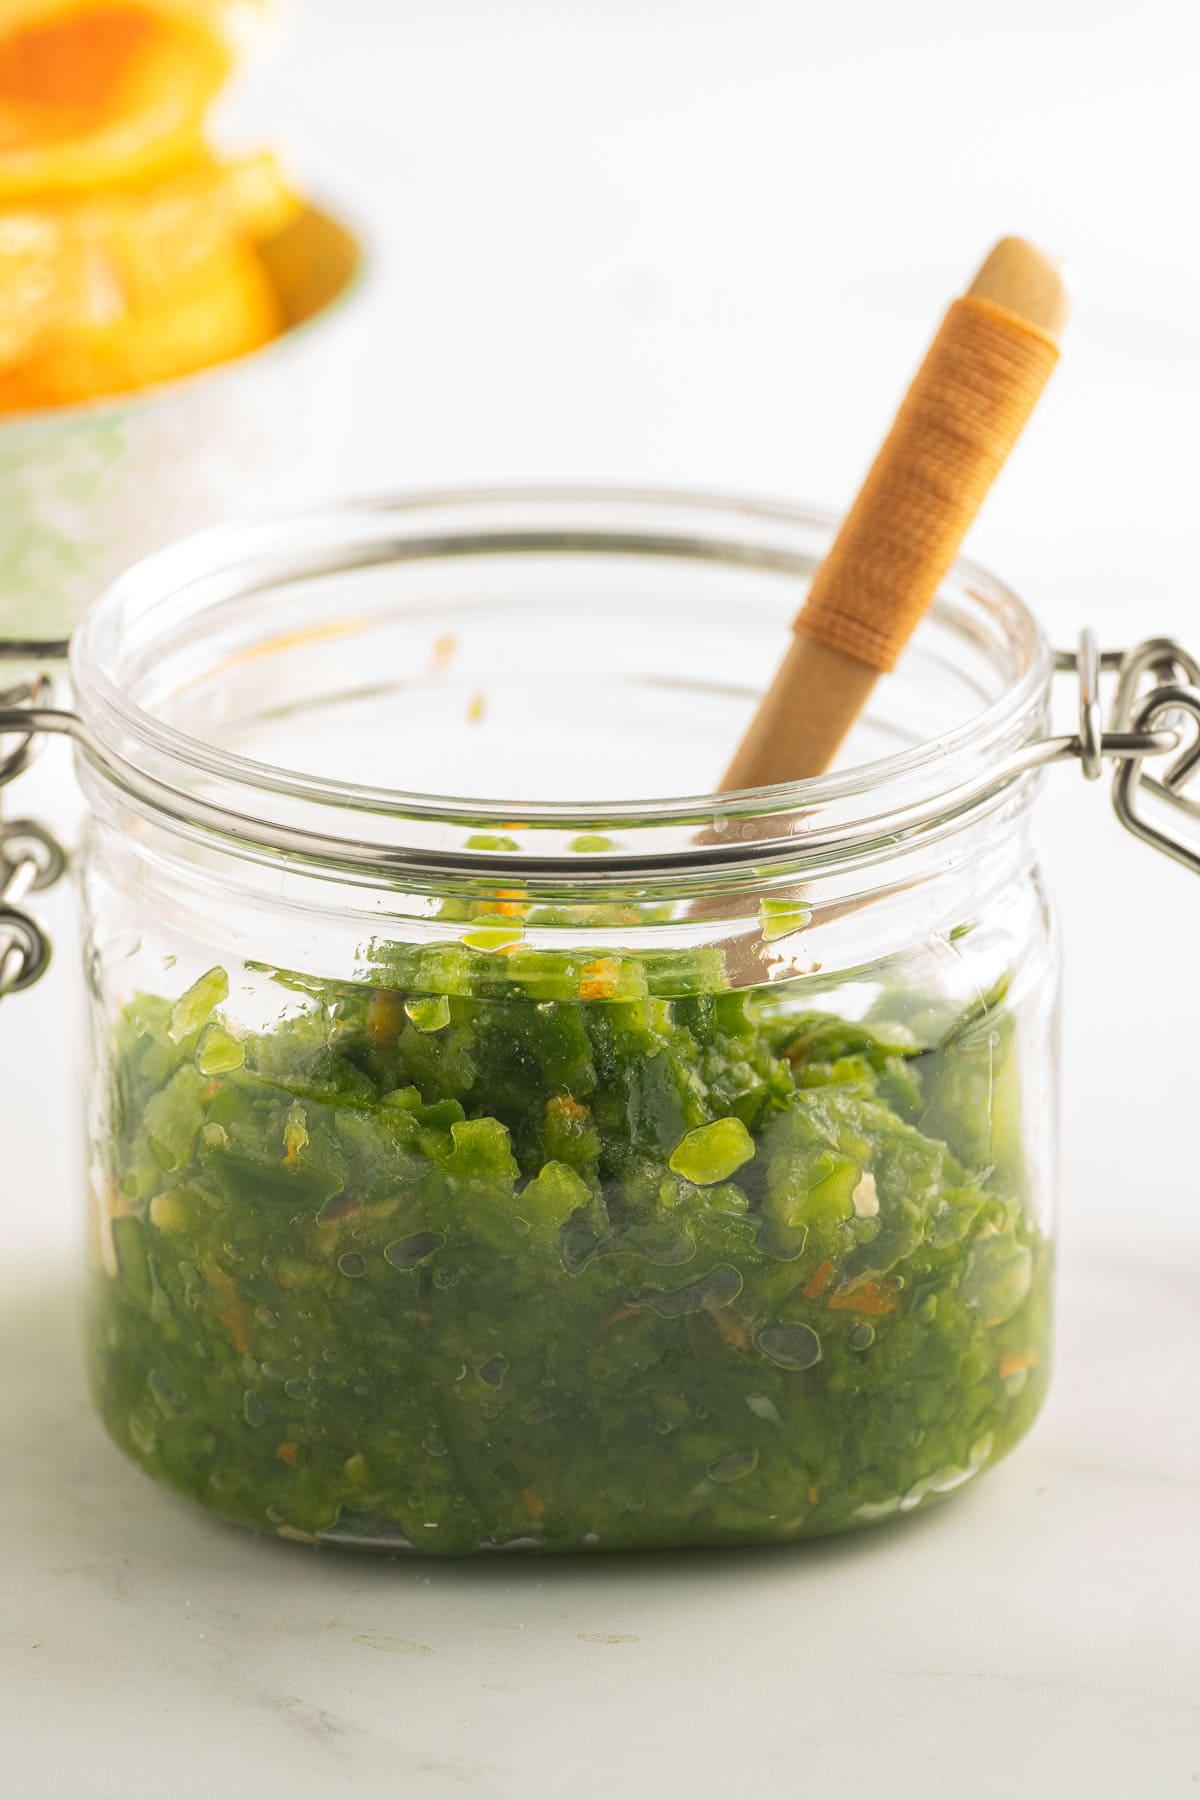 Jalapeno orange relish in glass jar with mini spoon